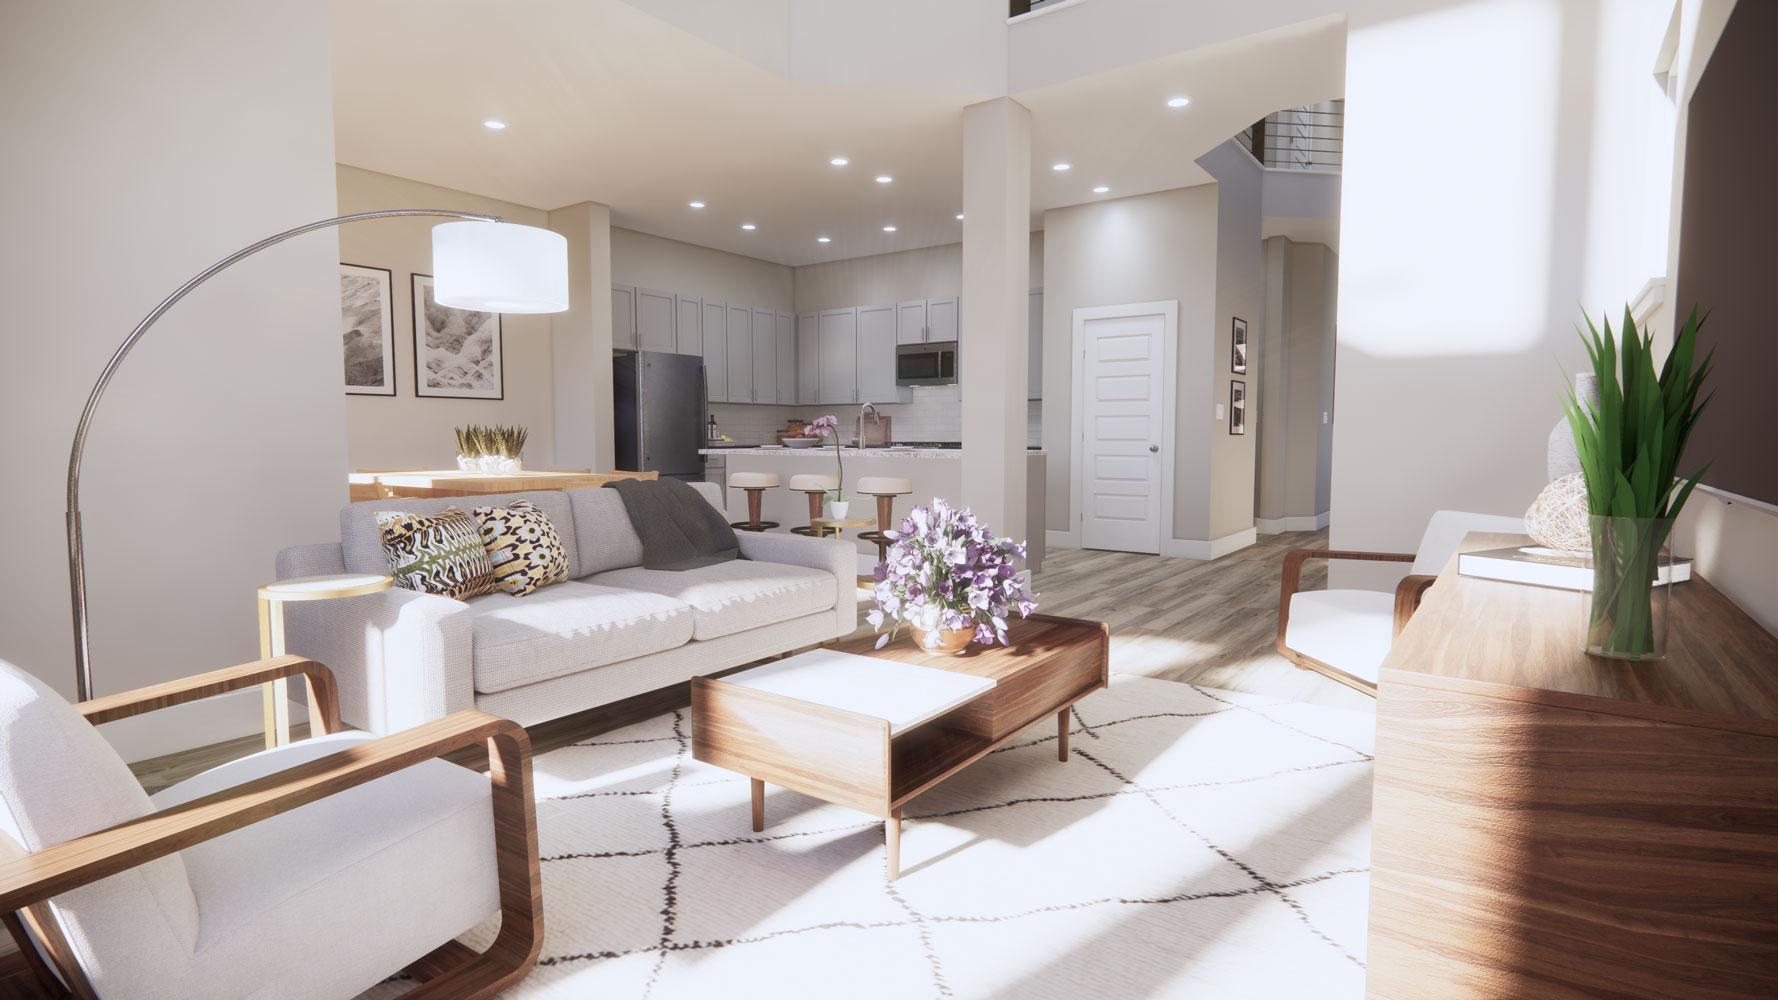 Dallas Homes for Rent at Echelon at Reverchon Bluffs in Dallas, Texas